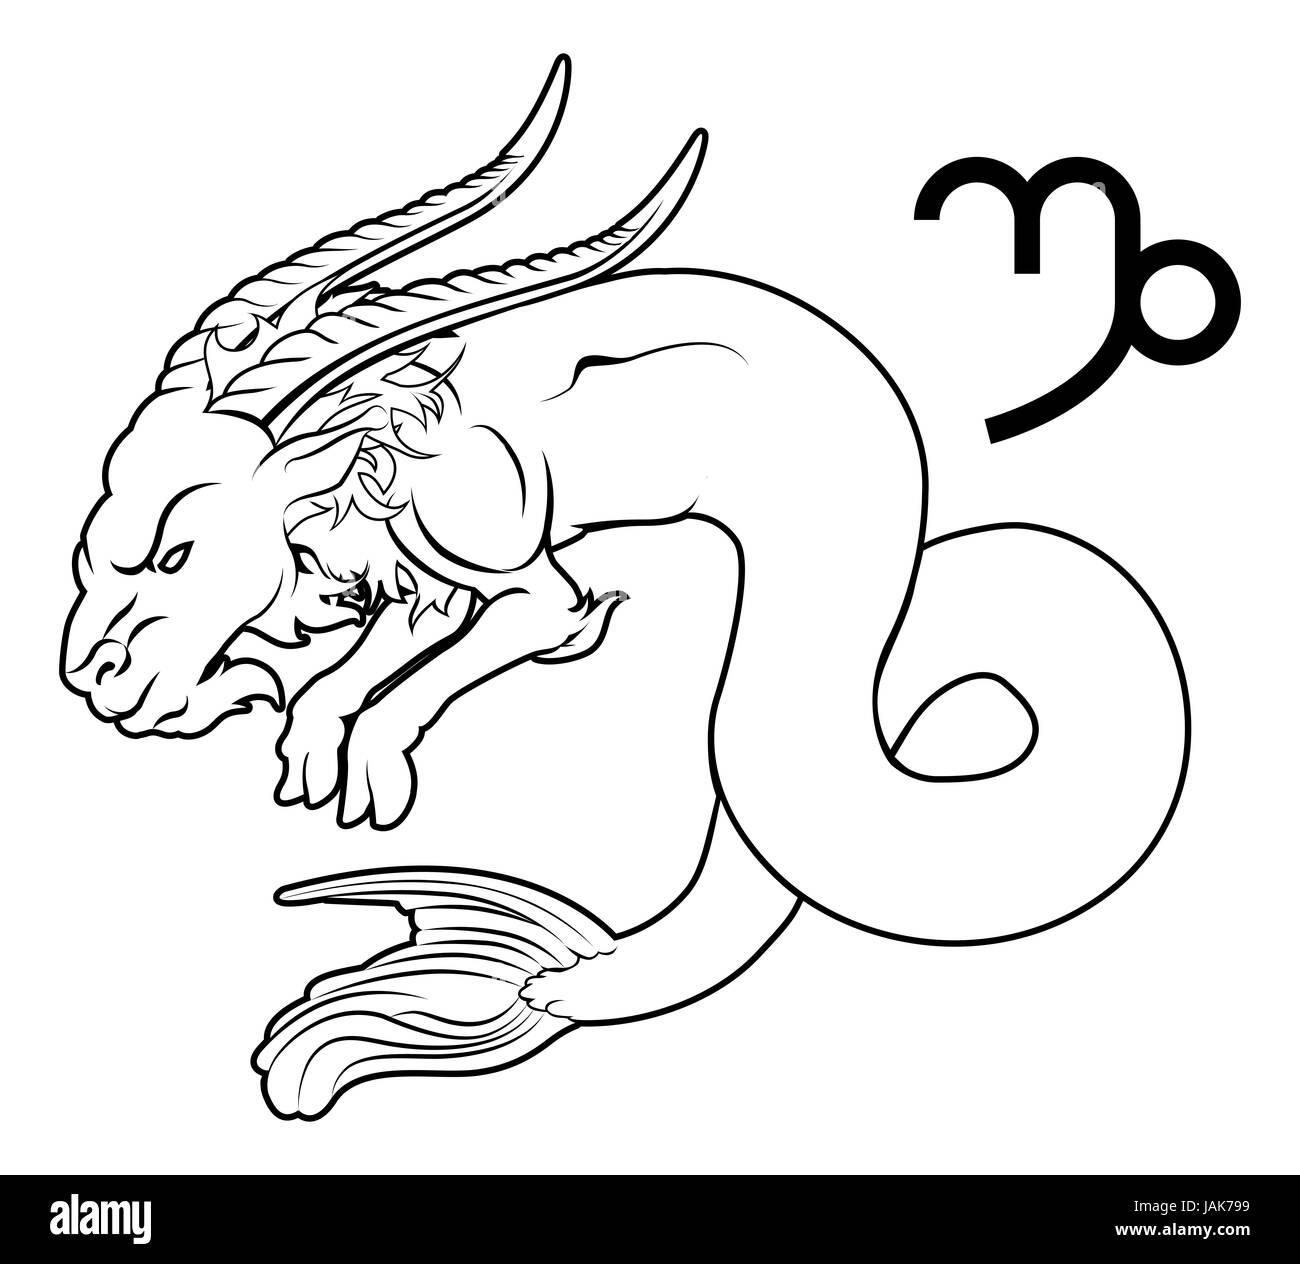 Illustration of Capricorn the sea goat zodiac horoscope astrology sign - Stock Image